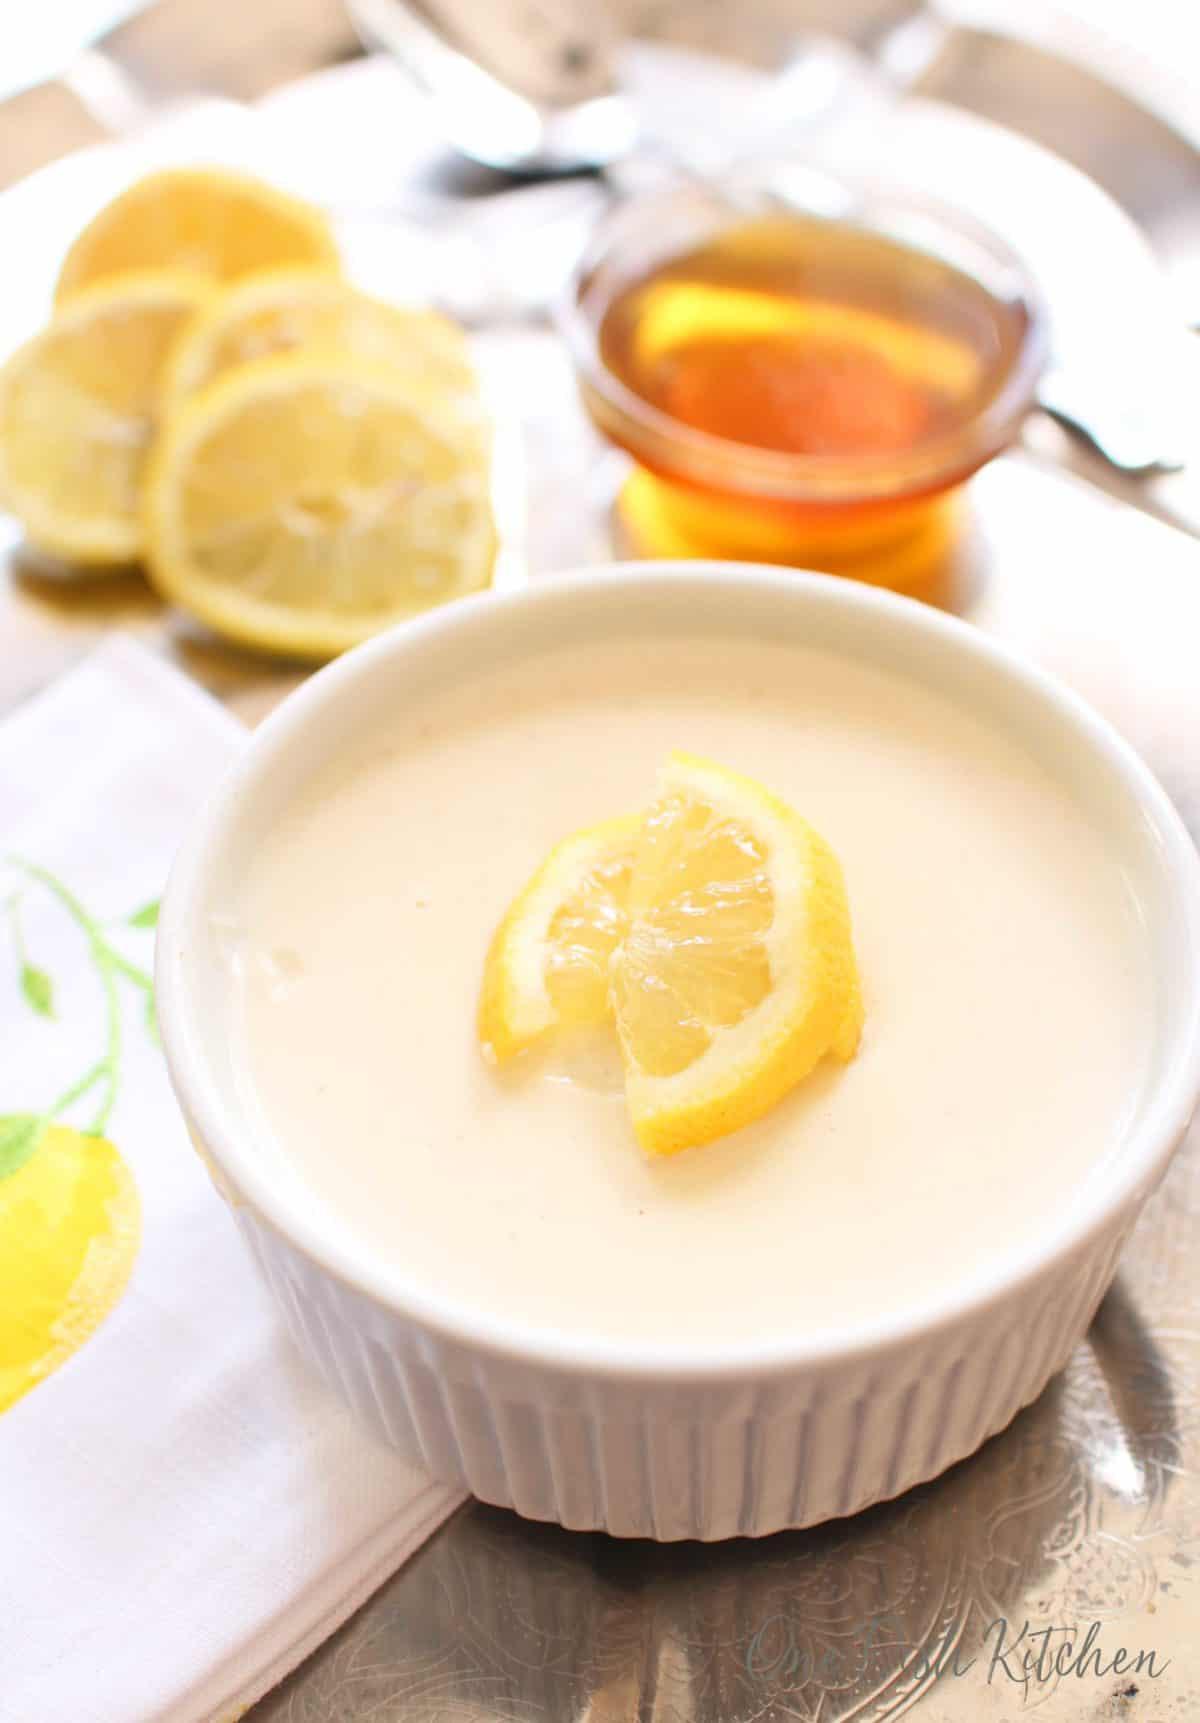 Honey lemon custard in a small ramekin next to sliced lemons and a small bowl of honey all on a metal tray